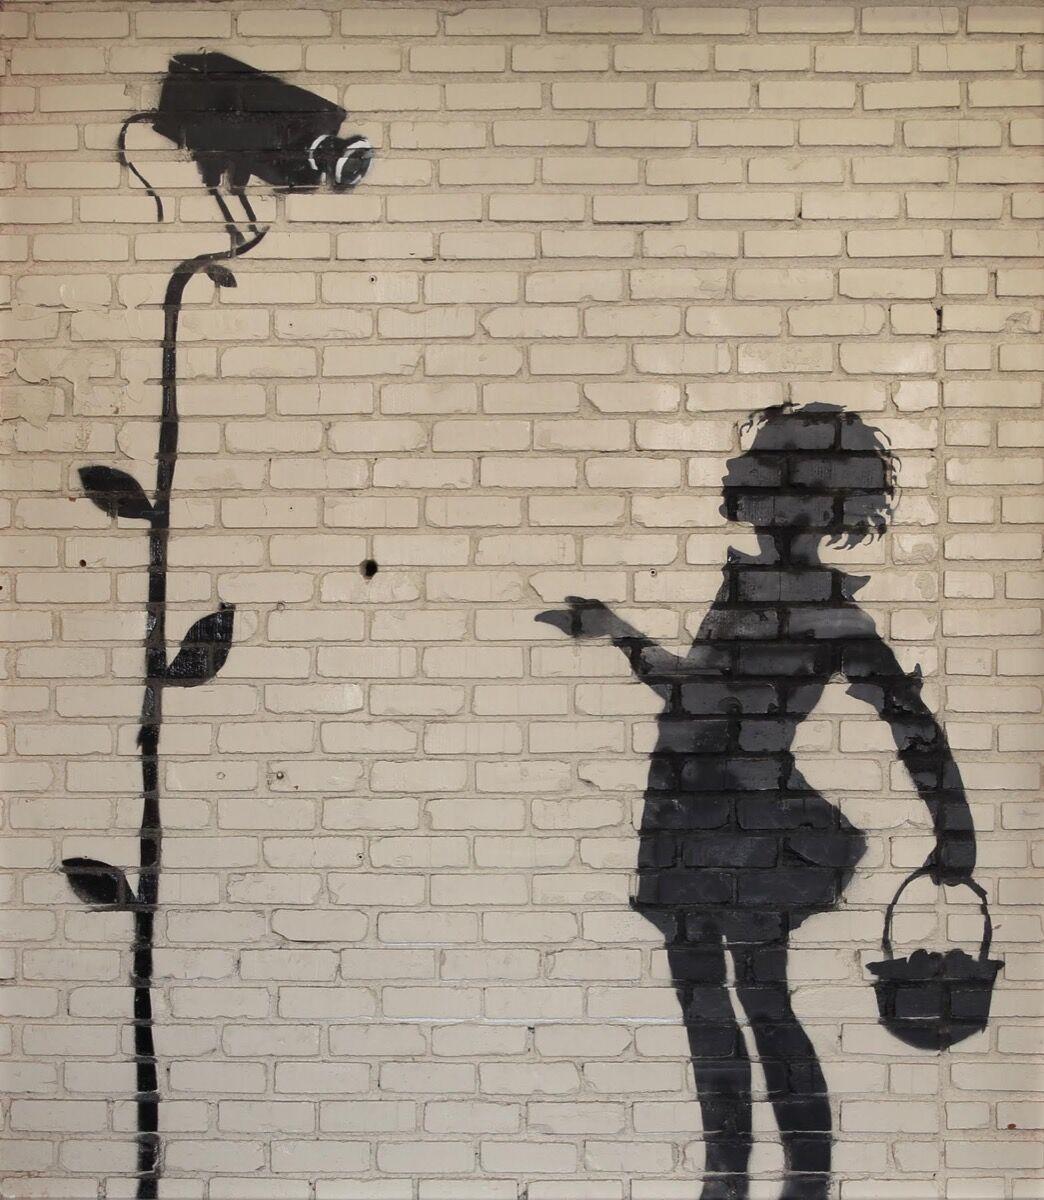 Banksy, Flower Girl, 2008. Courtesy of Julien's Auctions.